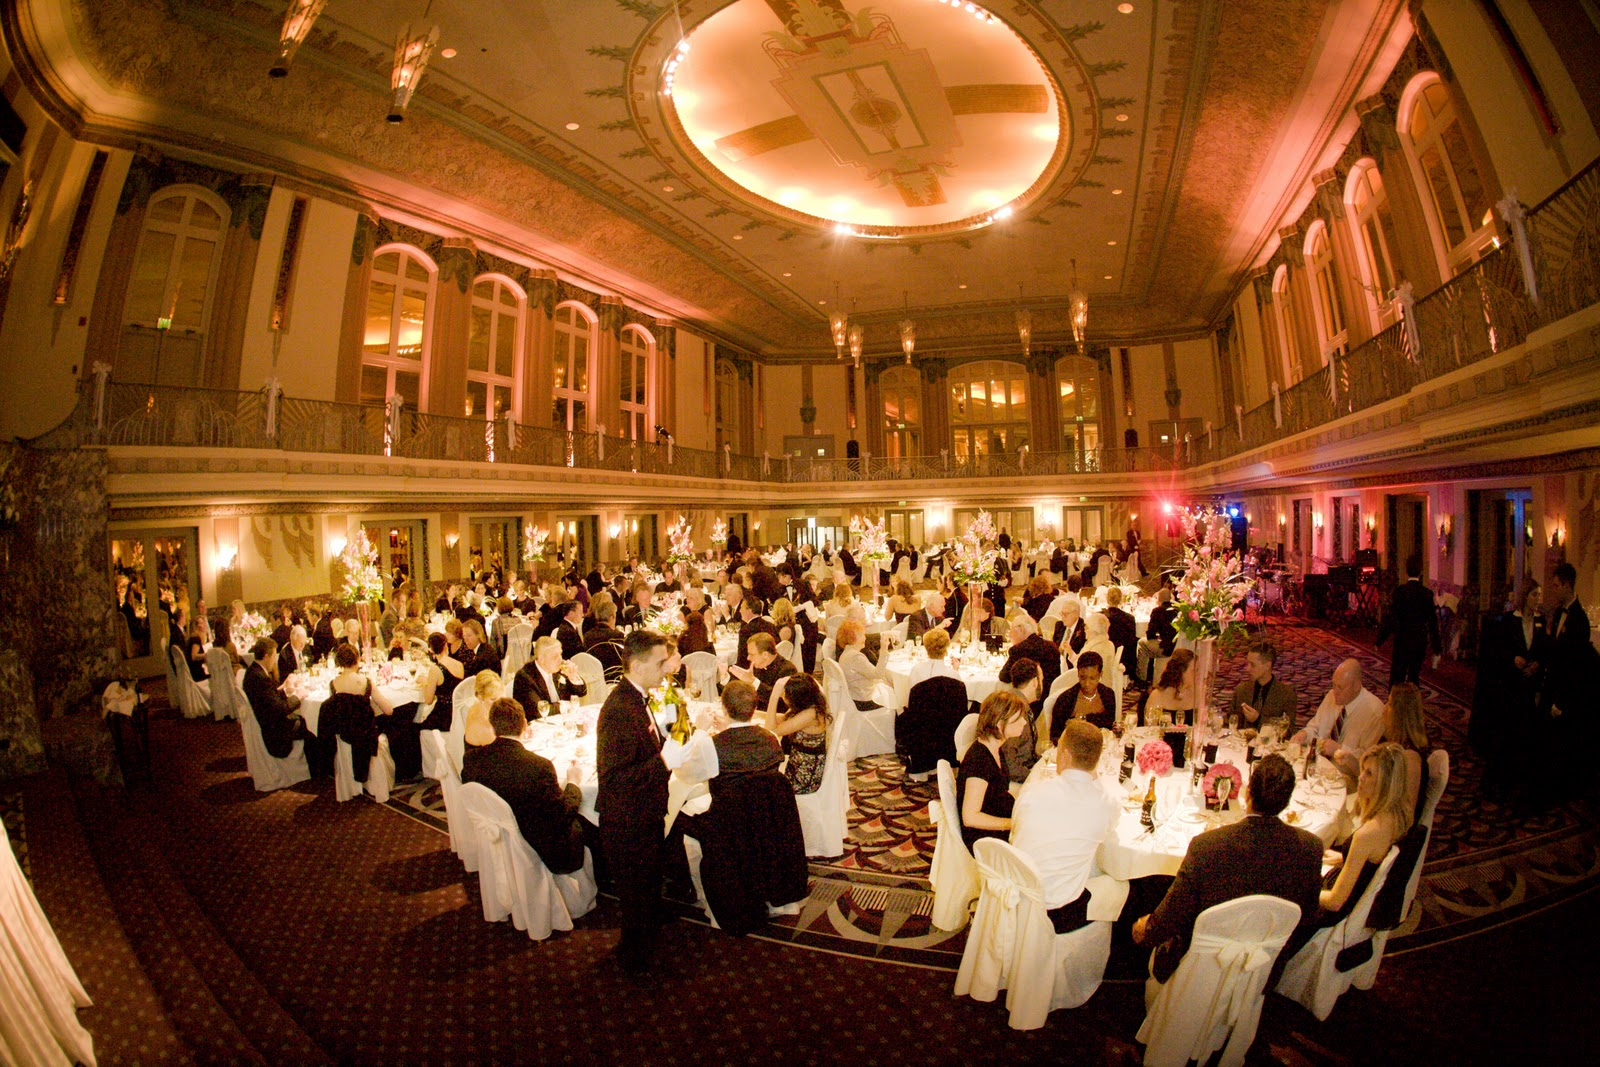 http://3.bp.blogspot.com/-nxfmF42Bh8U/Tn2UXJq0JiI/AAAAAAAAPvQ/HbFtEfX0bjQ/s1600/wedding+receptions+cincinnati+3.jpg